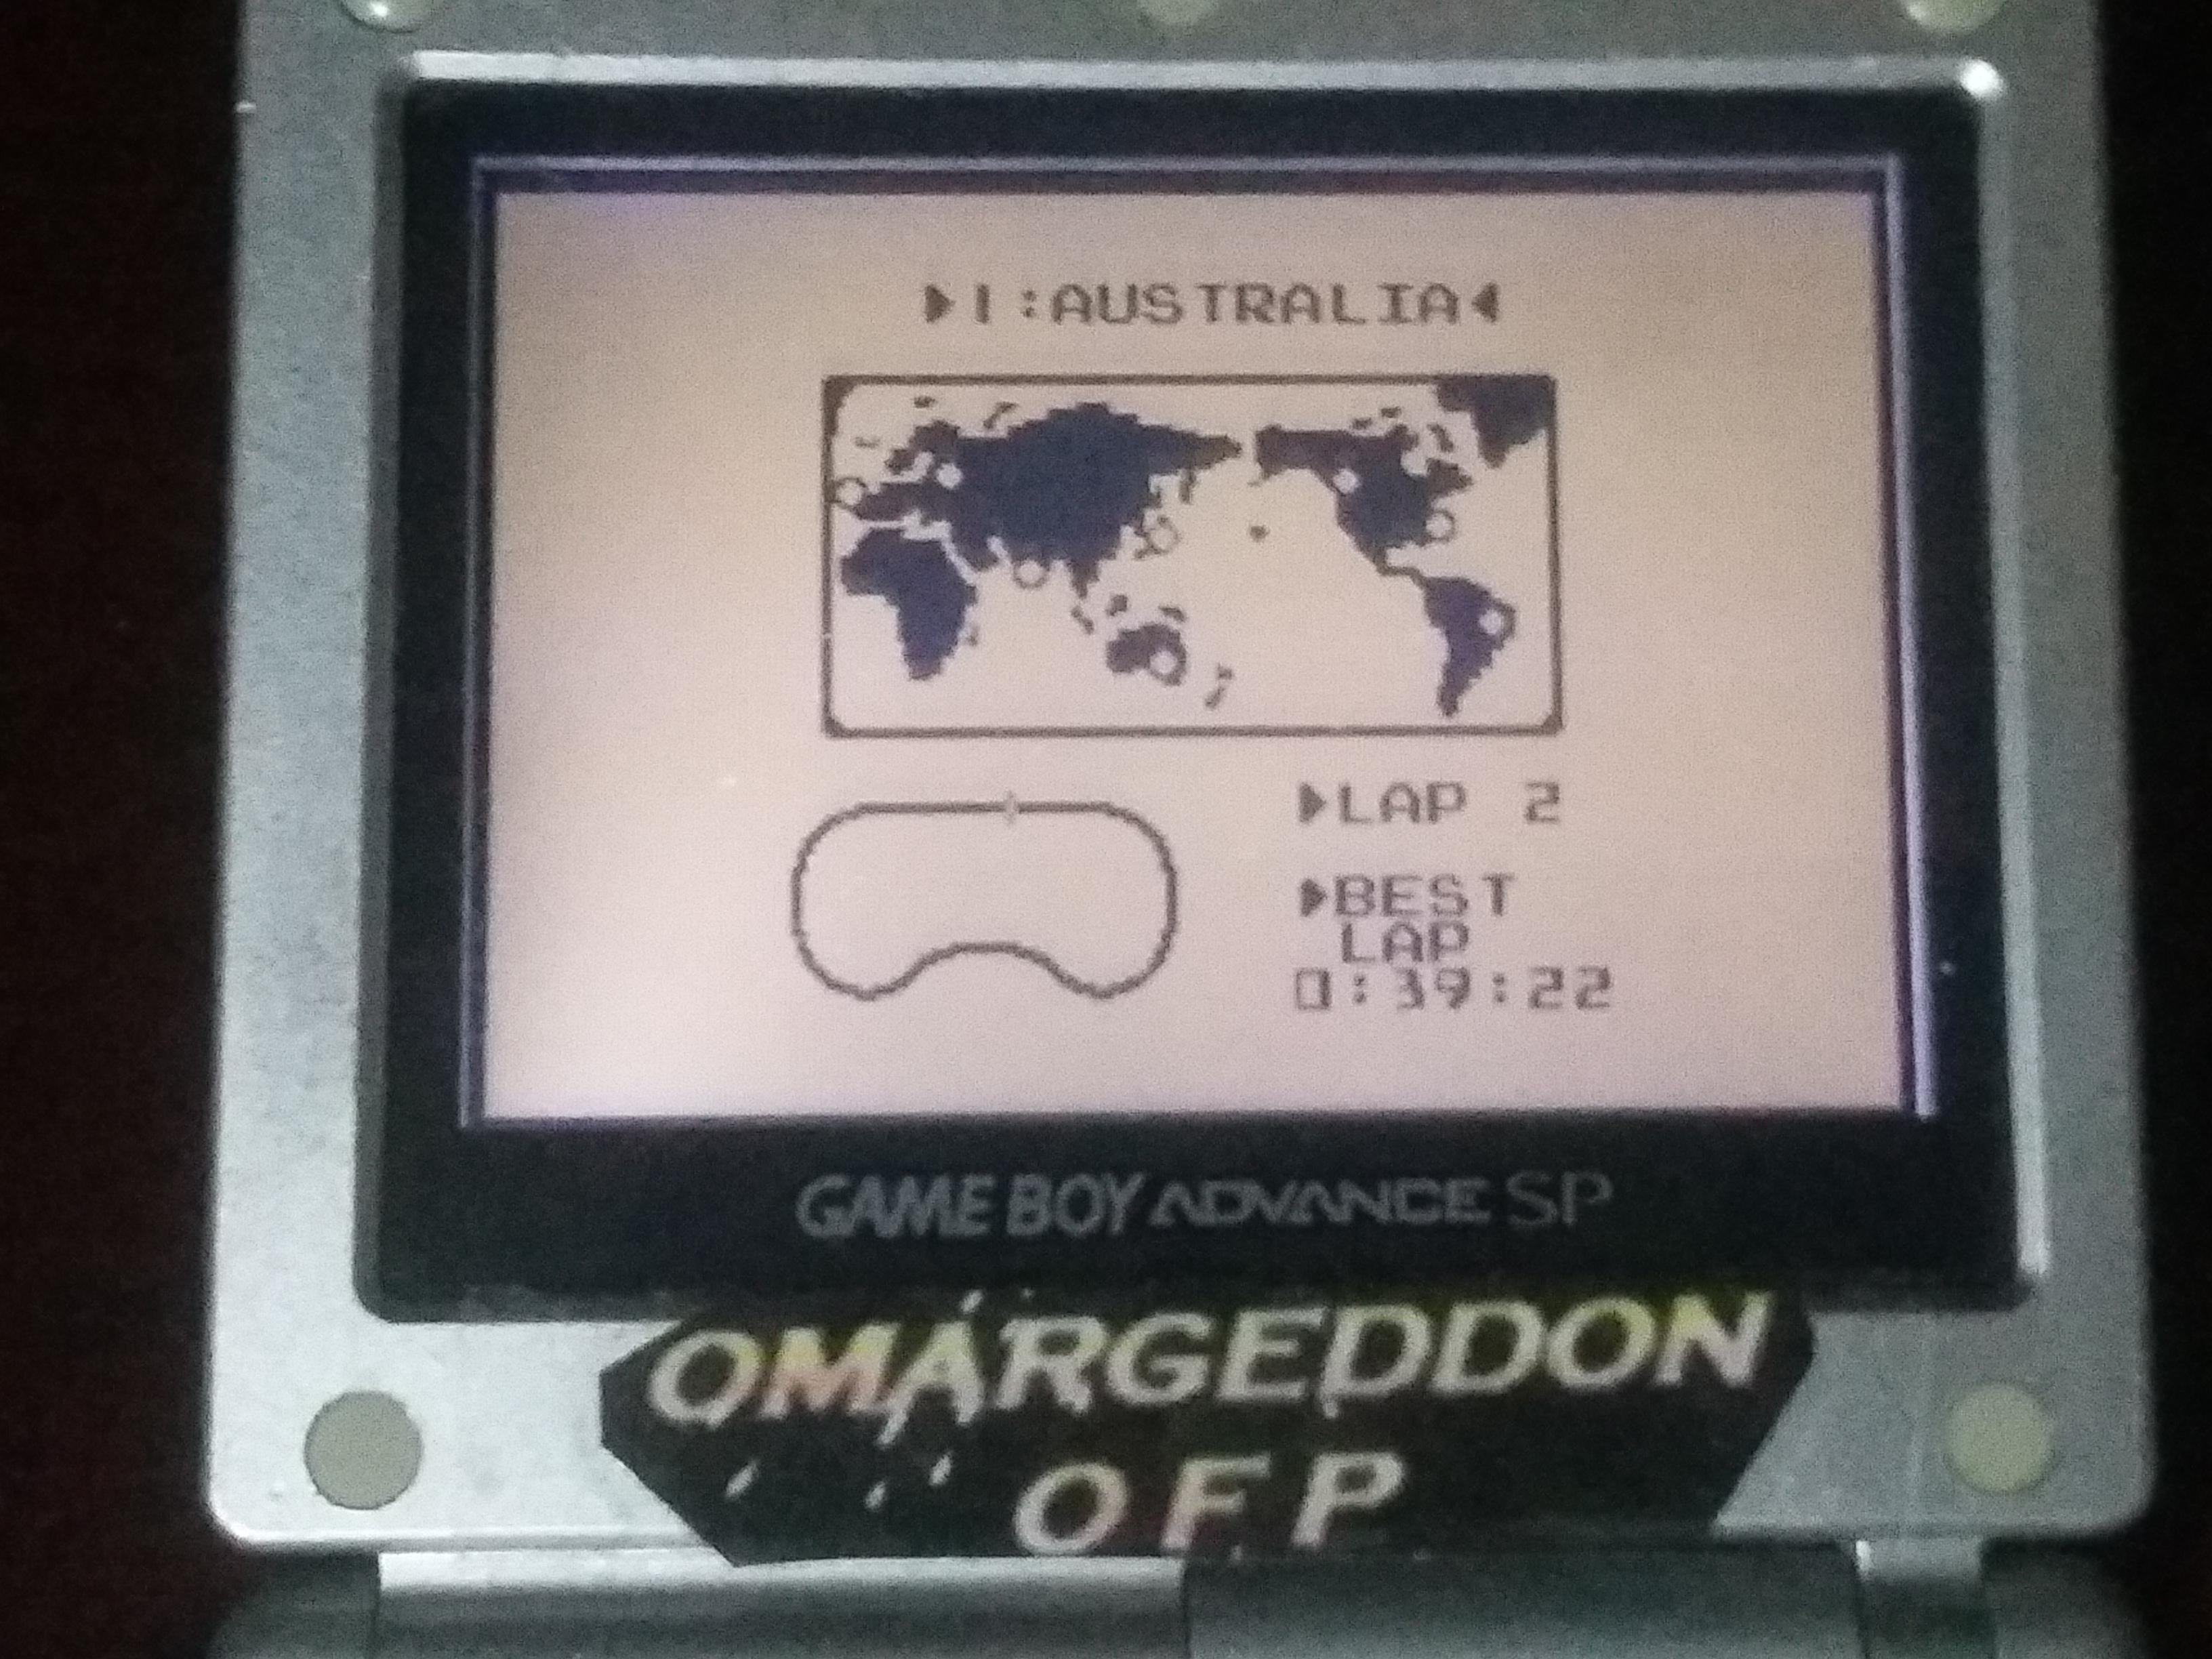 omargeddon: F-1 Race: Time Trials: Single: Australia [Best Lap] (Game Boy) 0:00:39.22 points on 2018-03-19 01:17:36